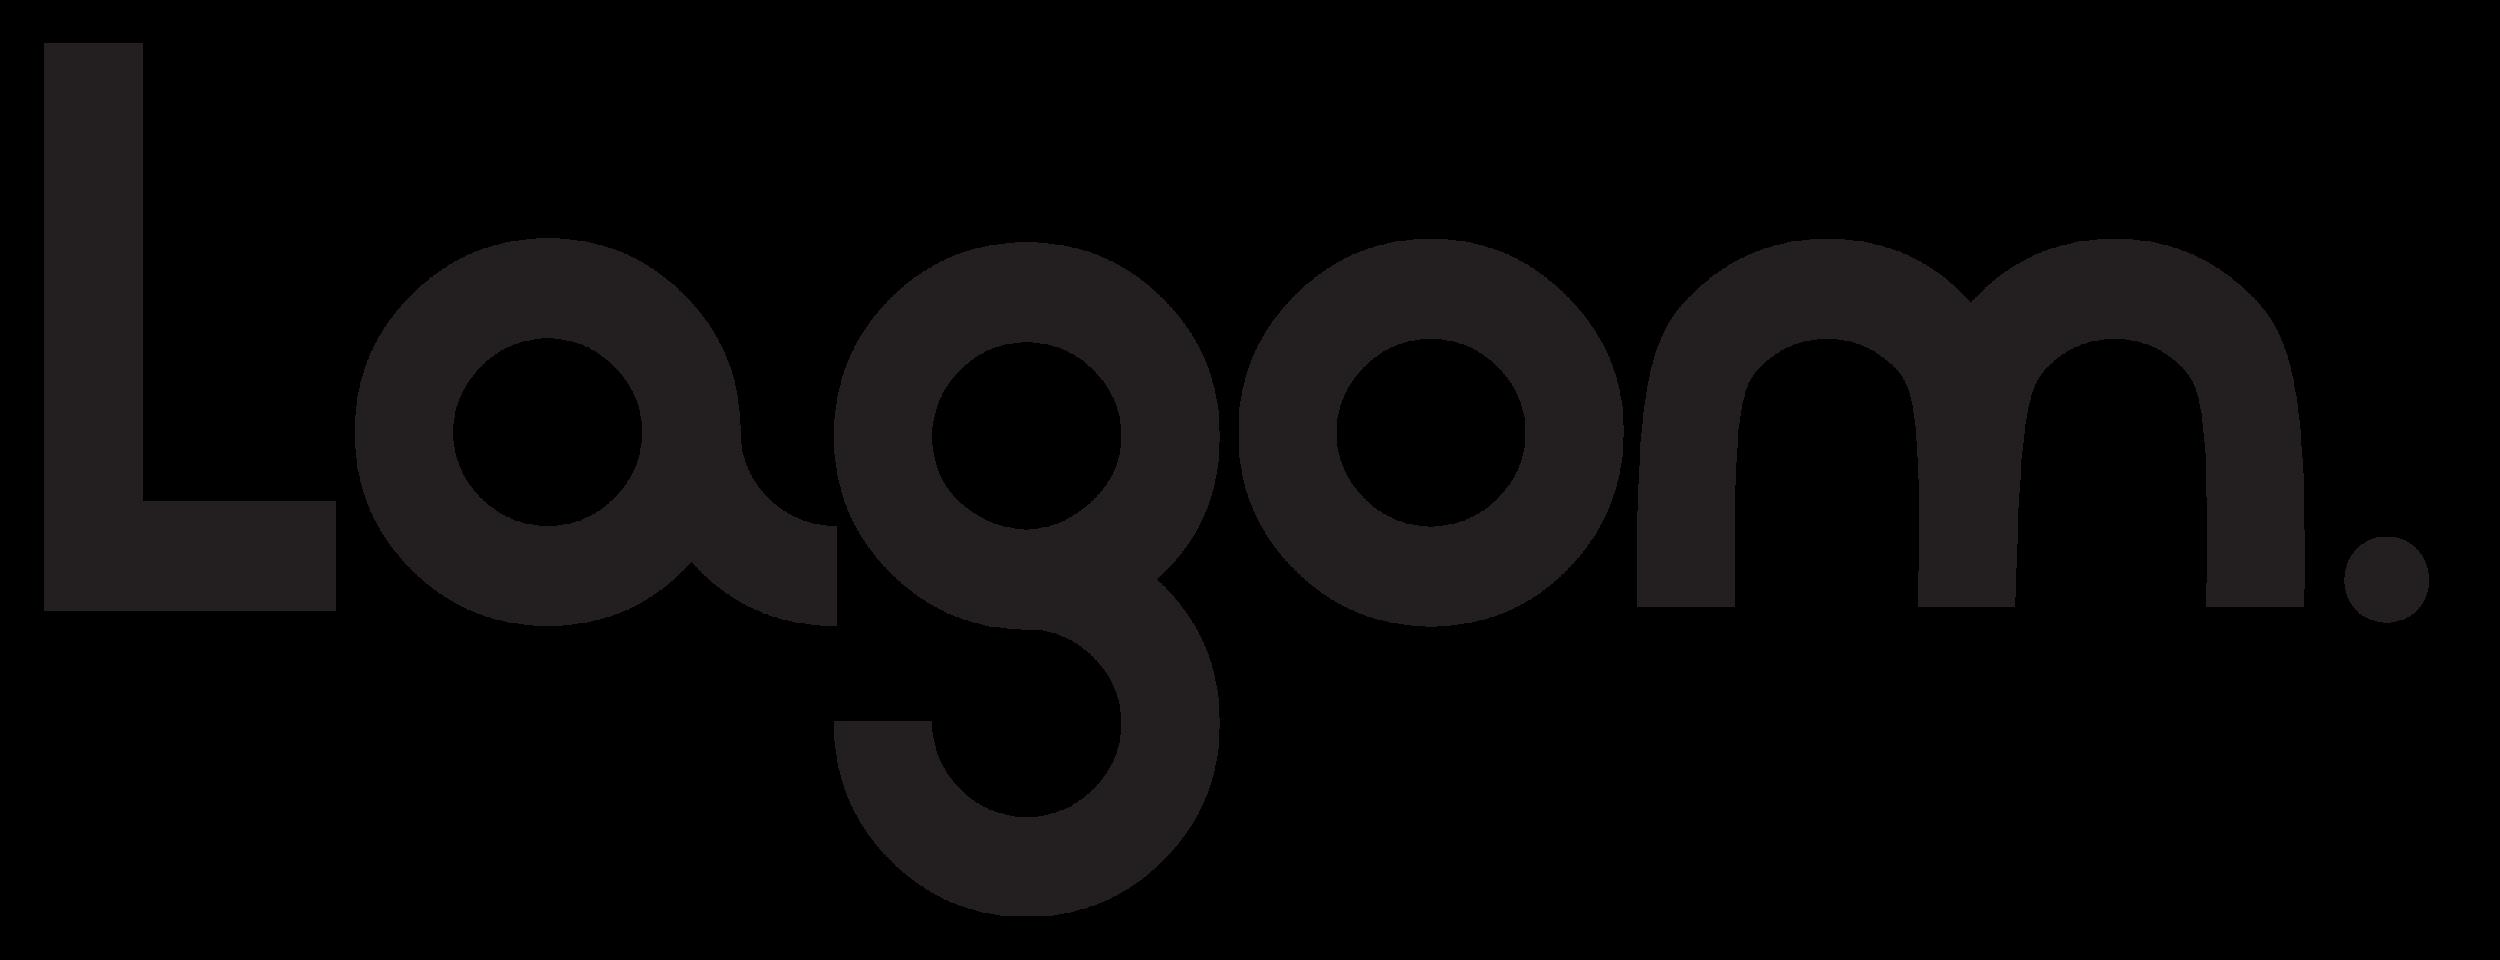 Lagom Logo Black CMYK.png